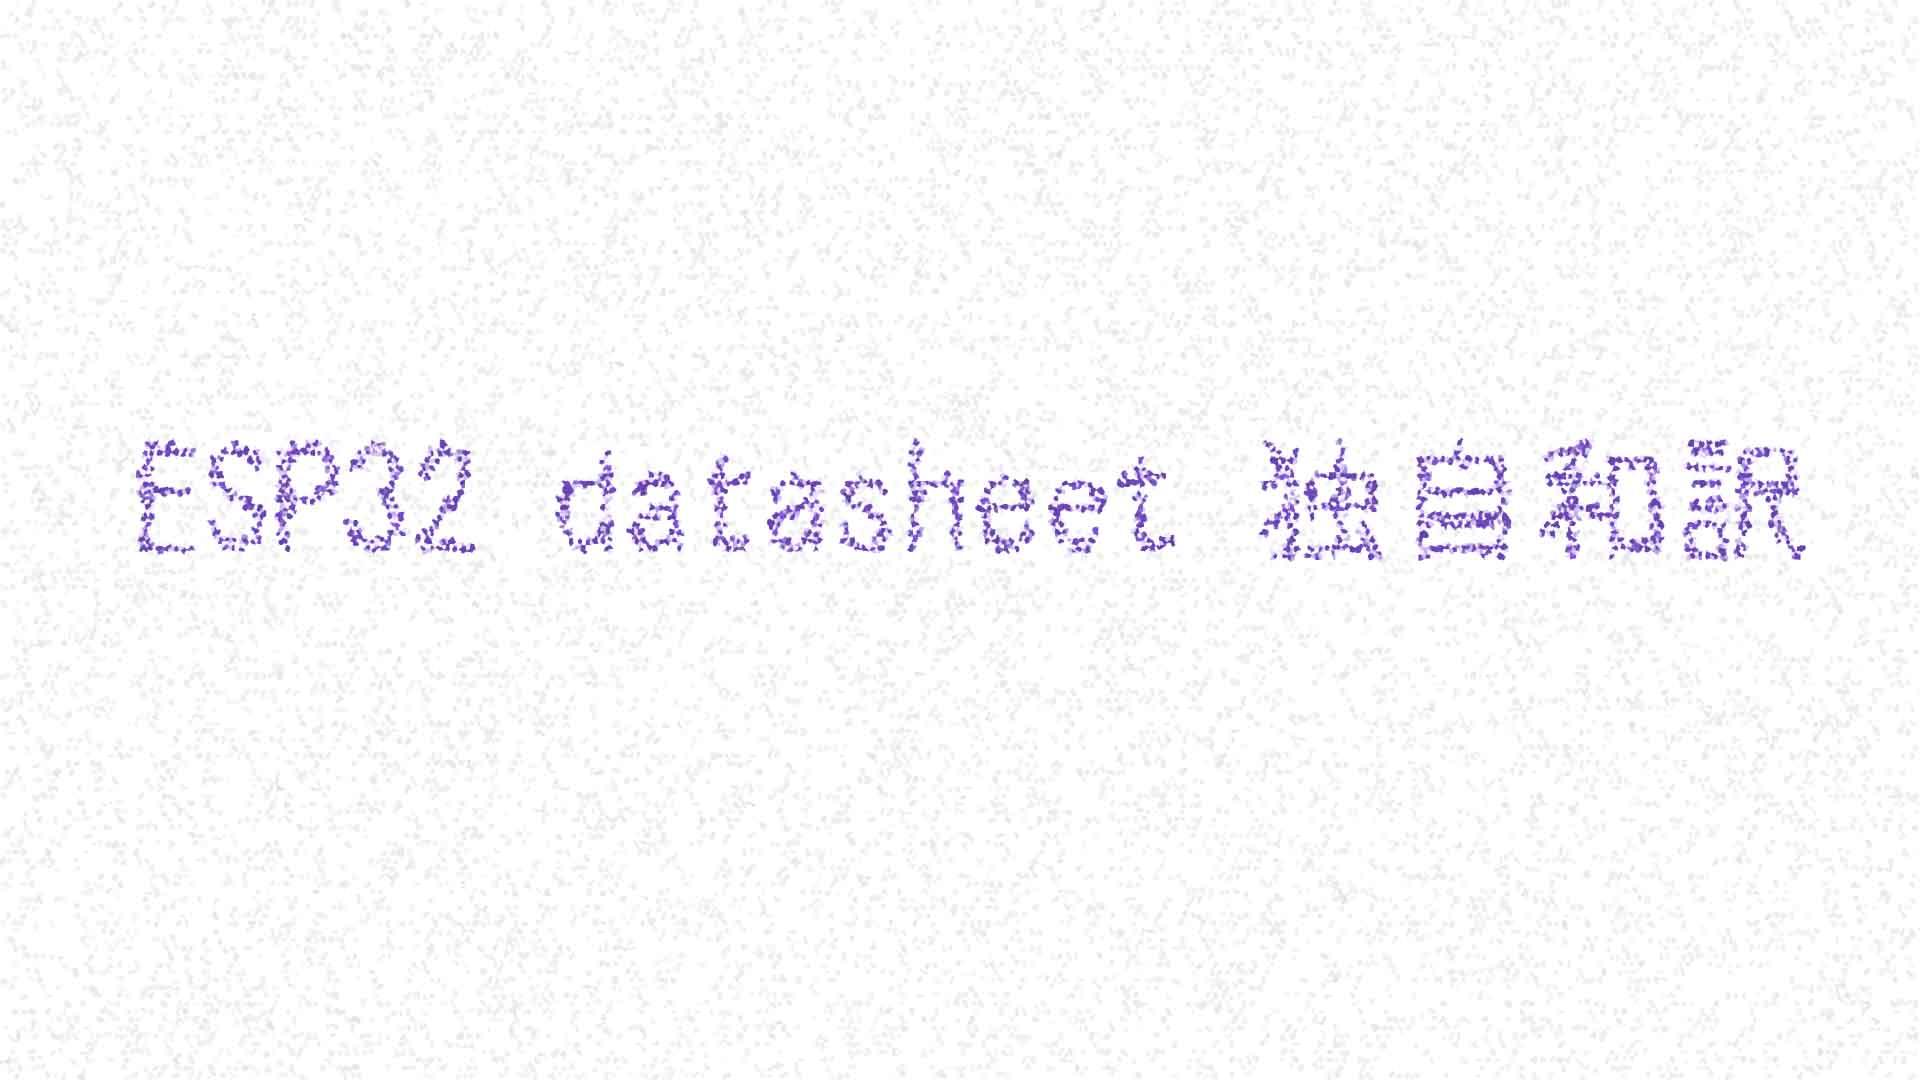 ESP32データシートを独自に和訳してみた。今後徐々に追加予定